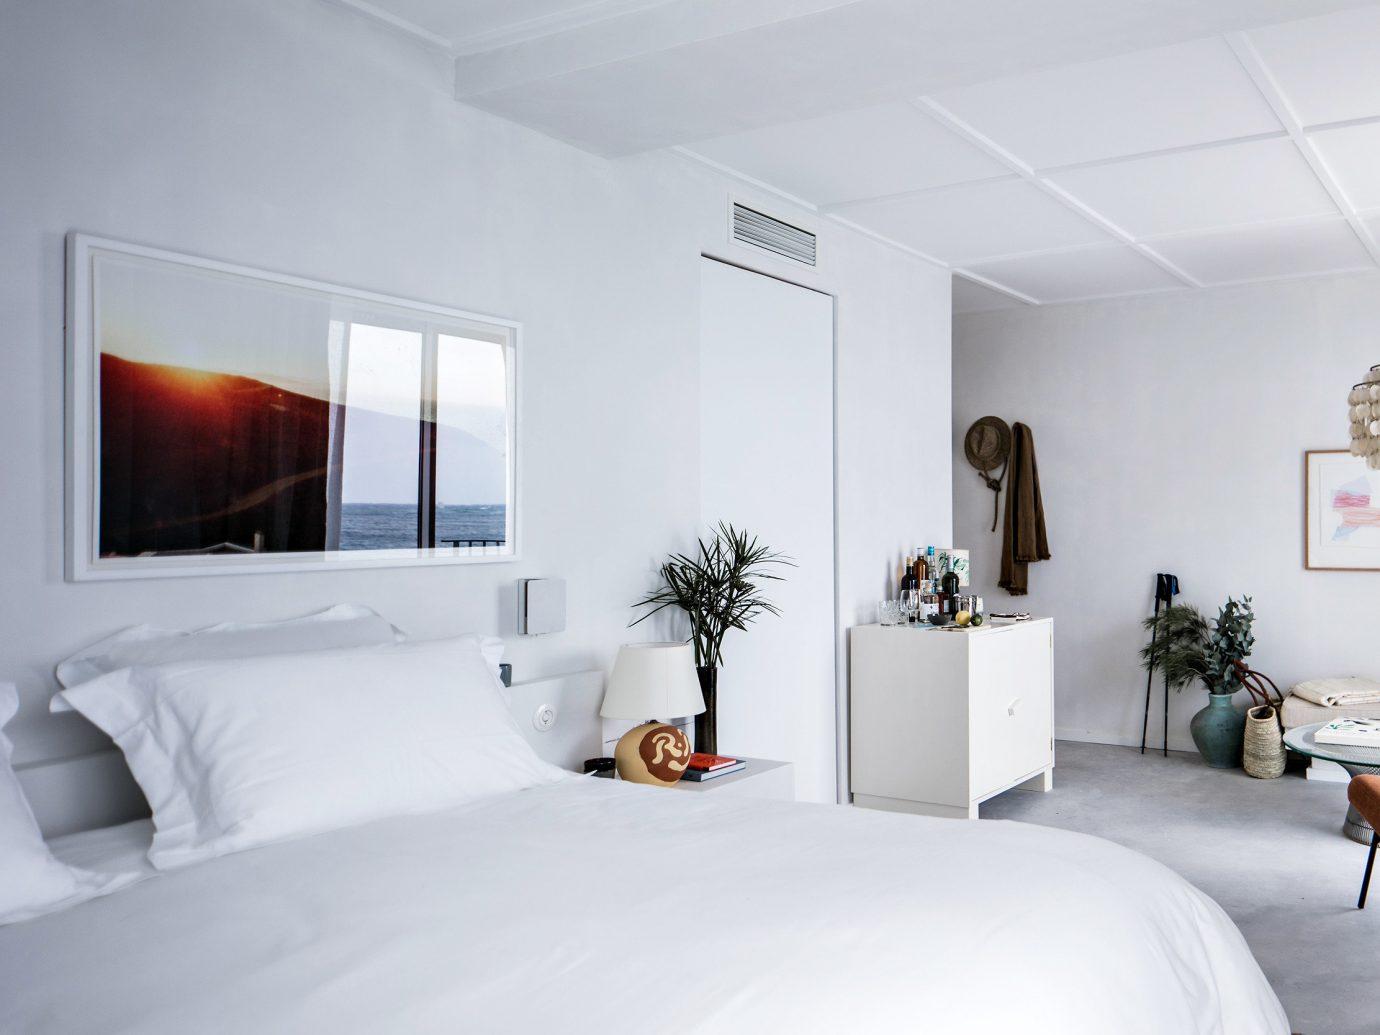 Hotels indoor wall bed room white ceiling interior design Suite Bedroom home pillow real estate bed frame interior designer furniture